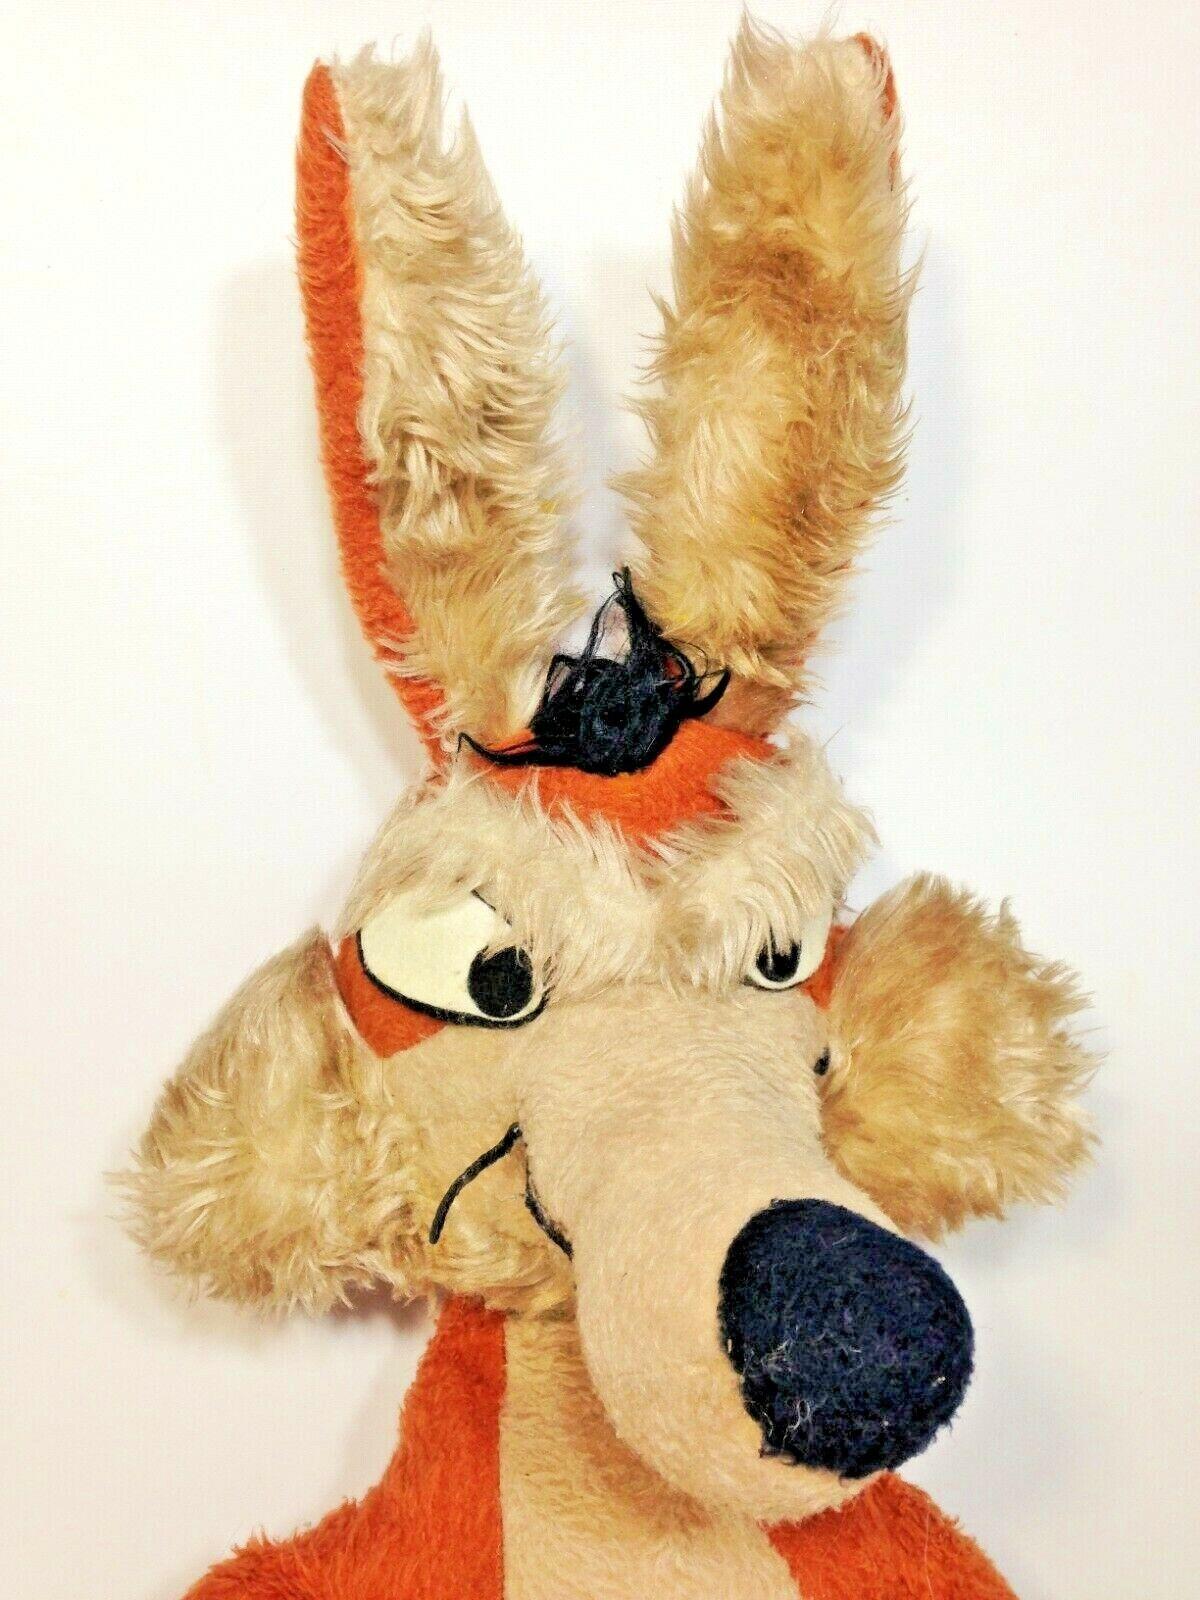 Wile E Coyote Plush RARE Jumbo 32  Warner Bros Looney Tunes Vintage 1970's Toy